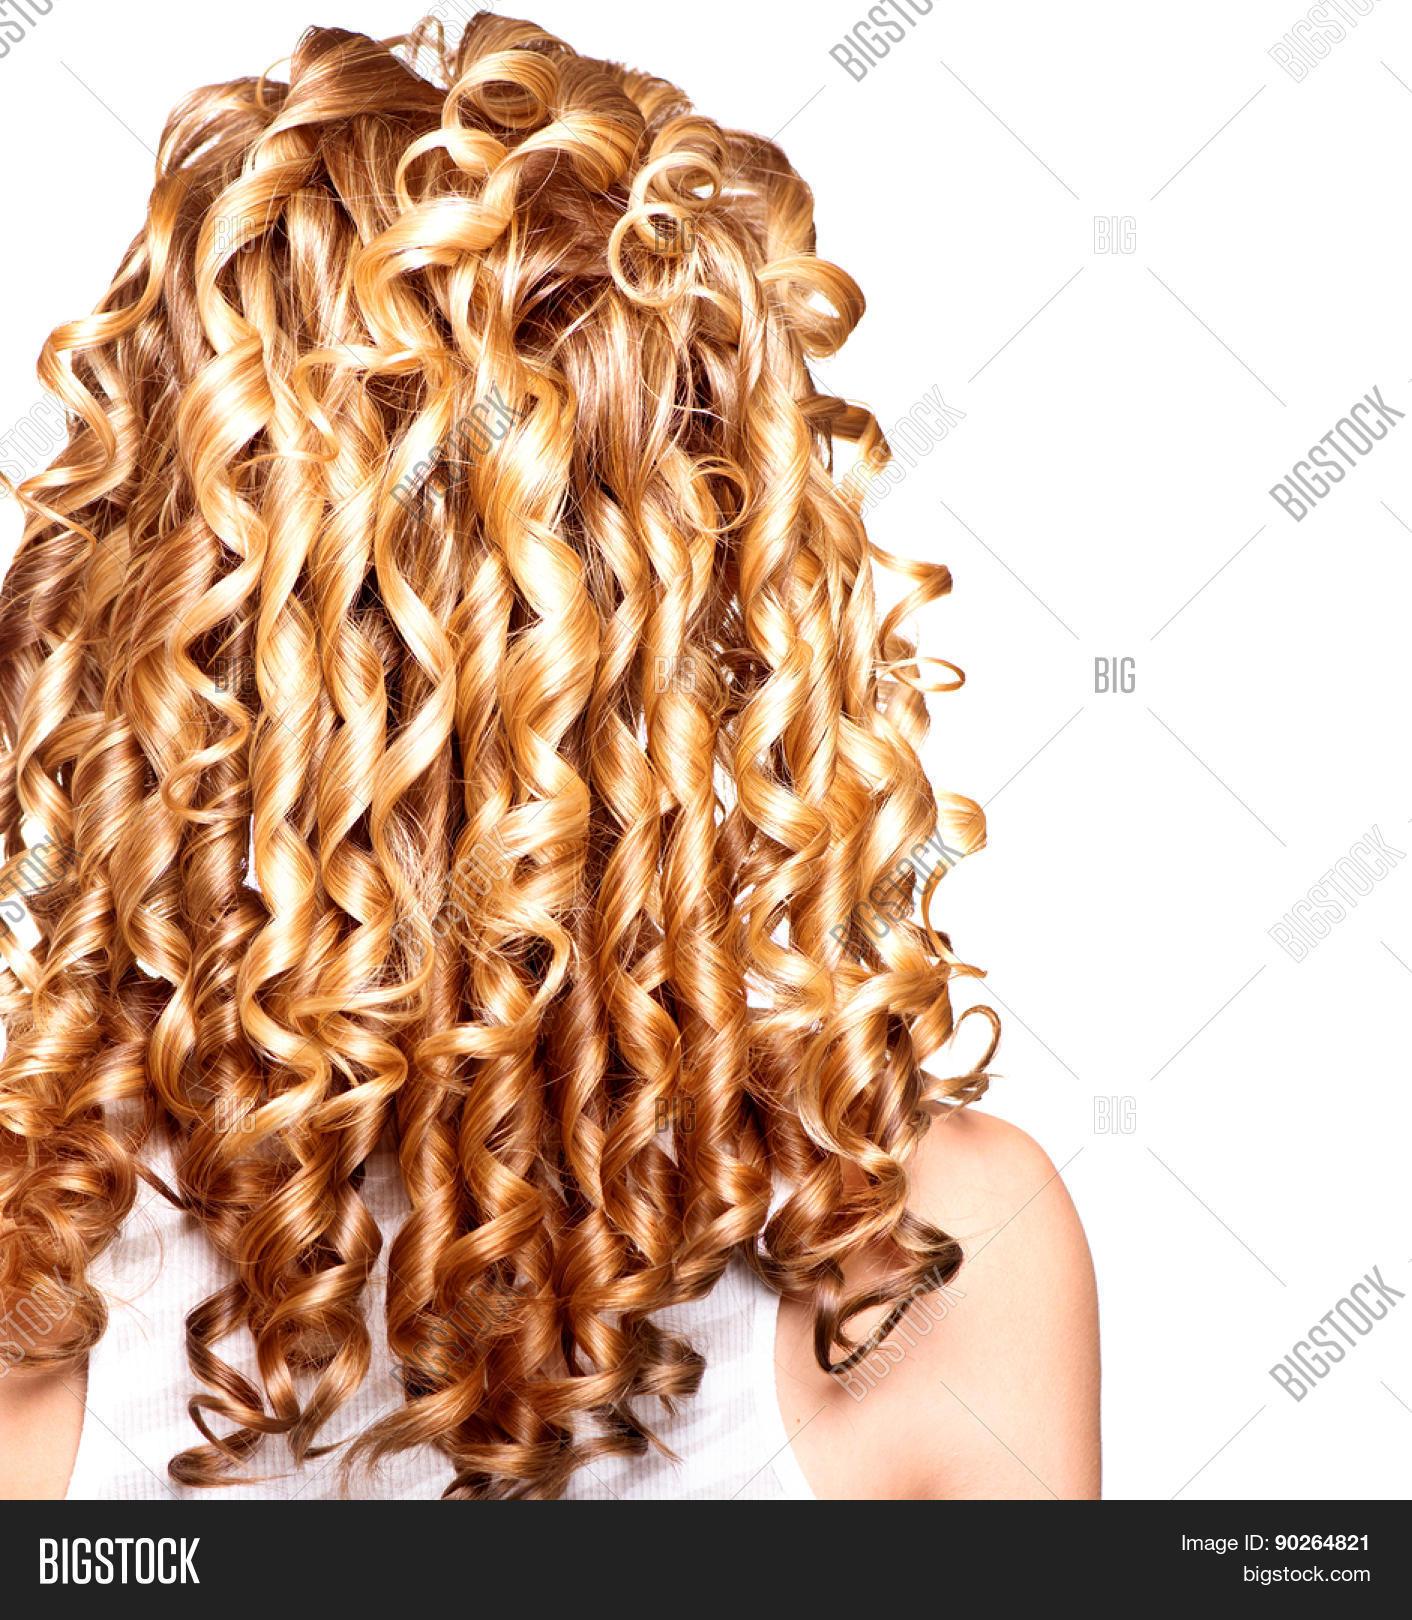 Beauty Girl Blonde Image Photo Free Trial Bigstock